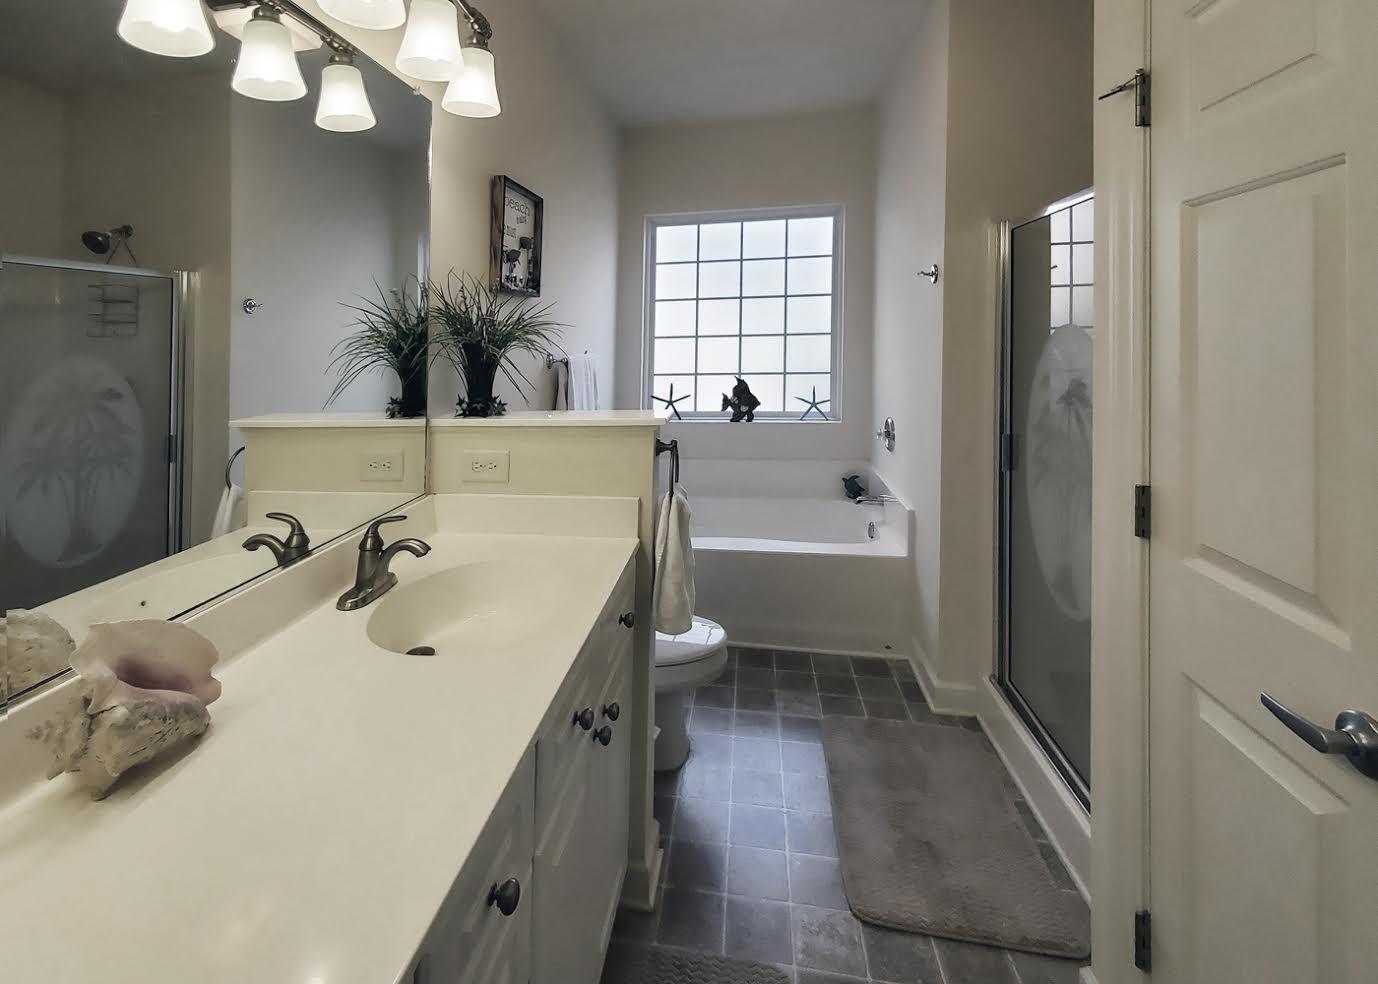 Grand Oaks Plantation Homes For Sale - 1607 Whitby, Charleston, SC - 3